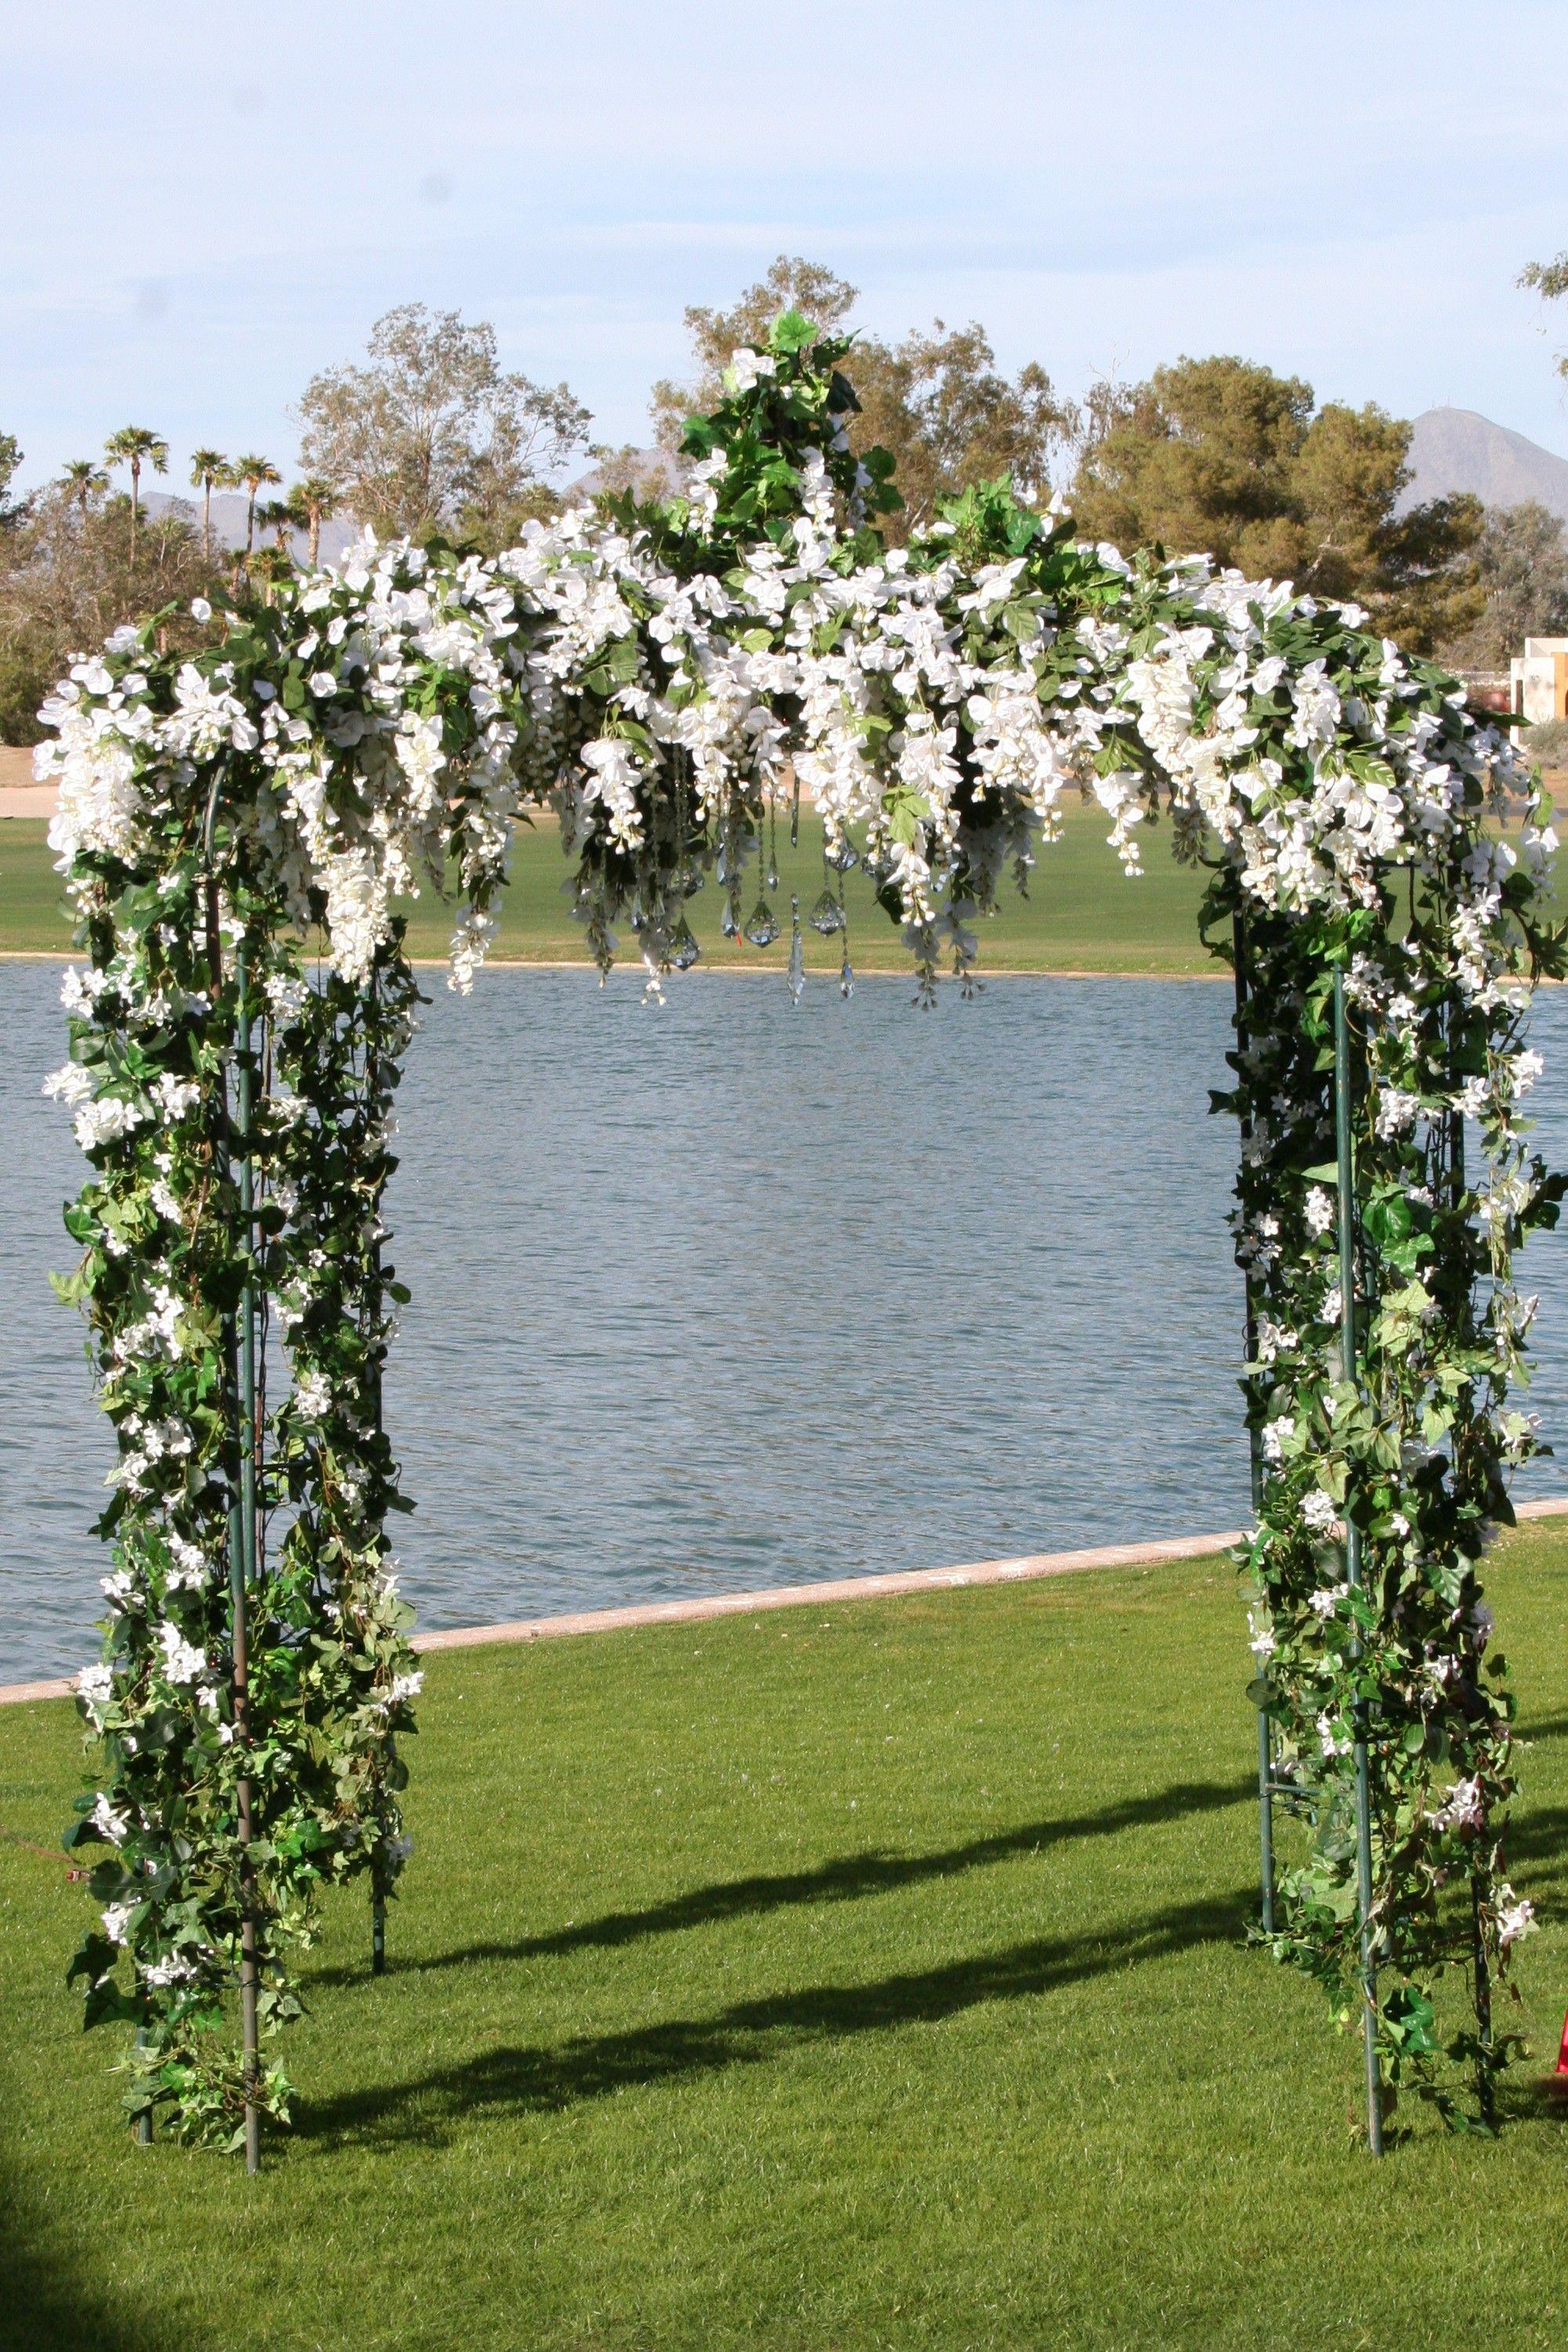 Outdoor Wedding Backdrop Gazebo Ivy Vines White Flowers